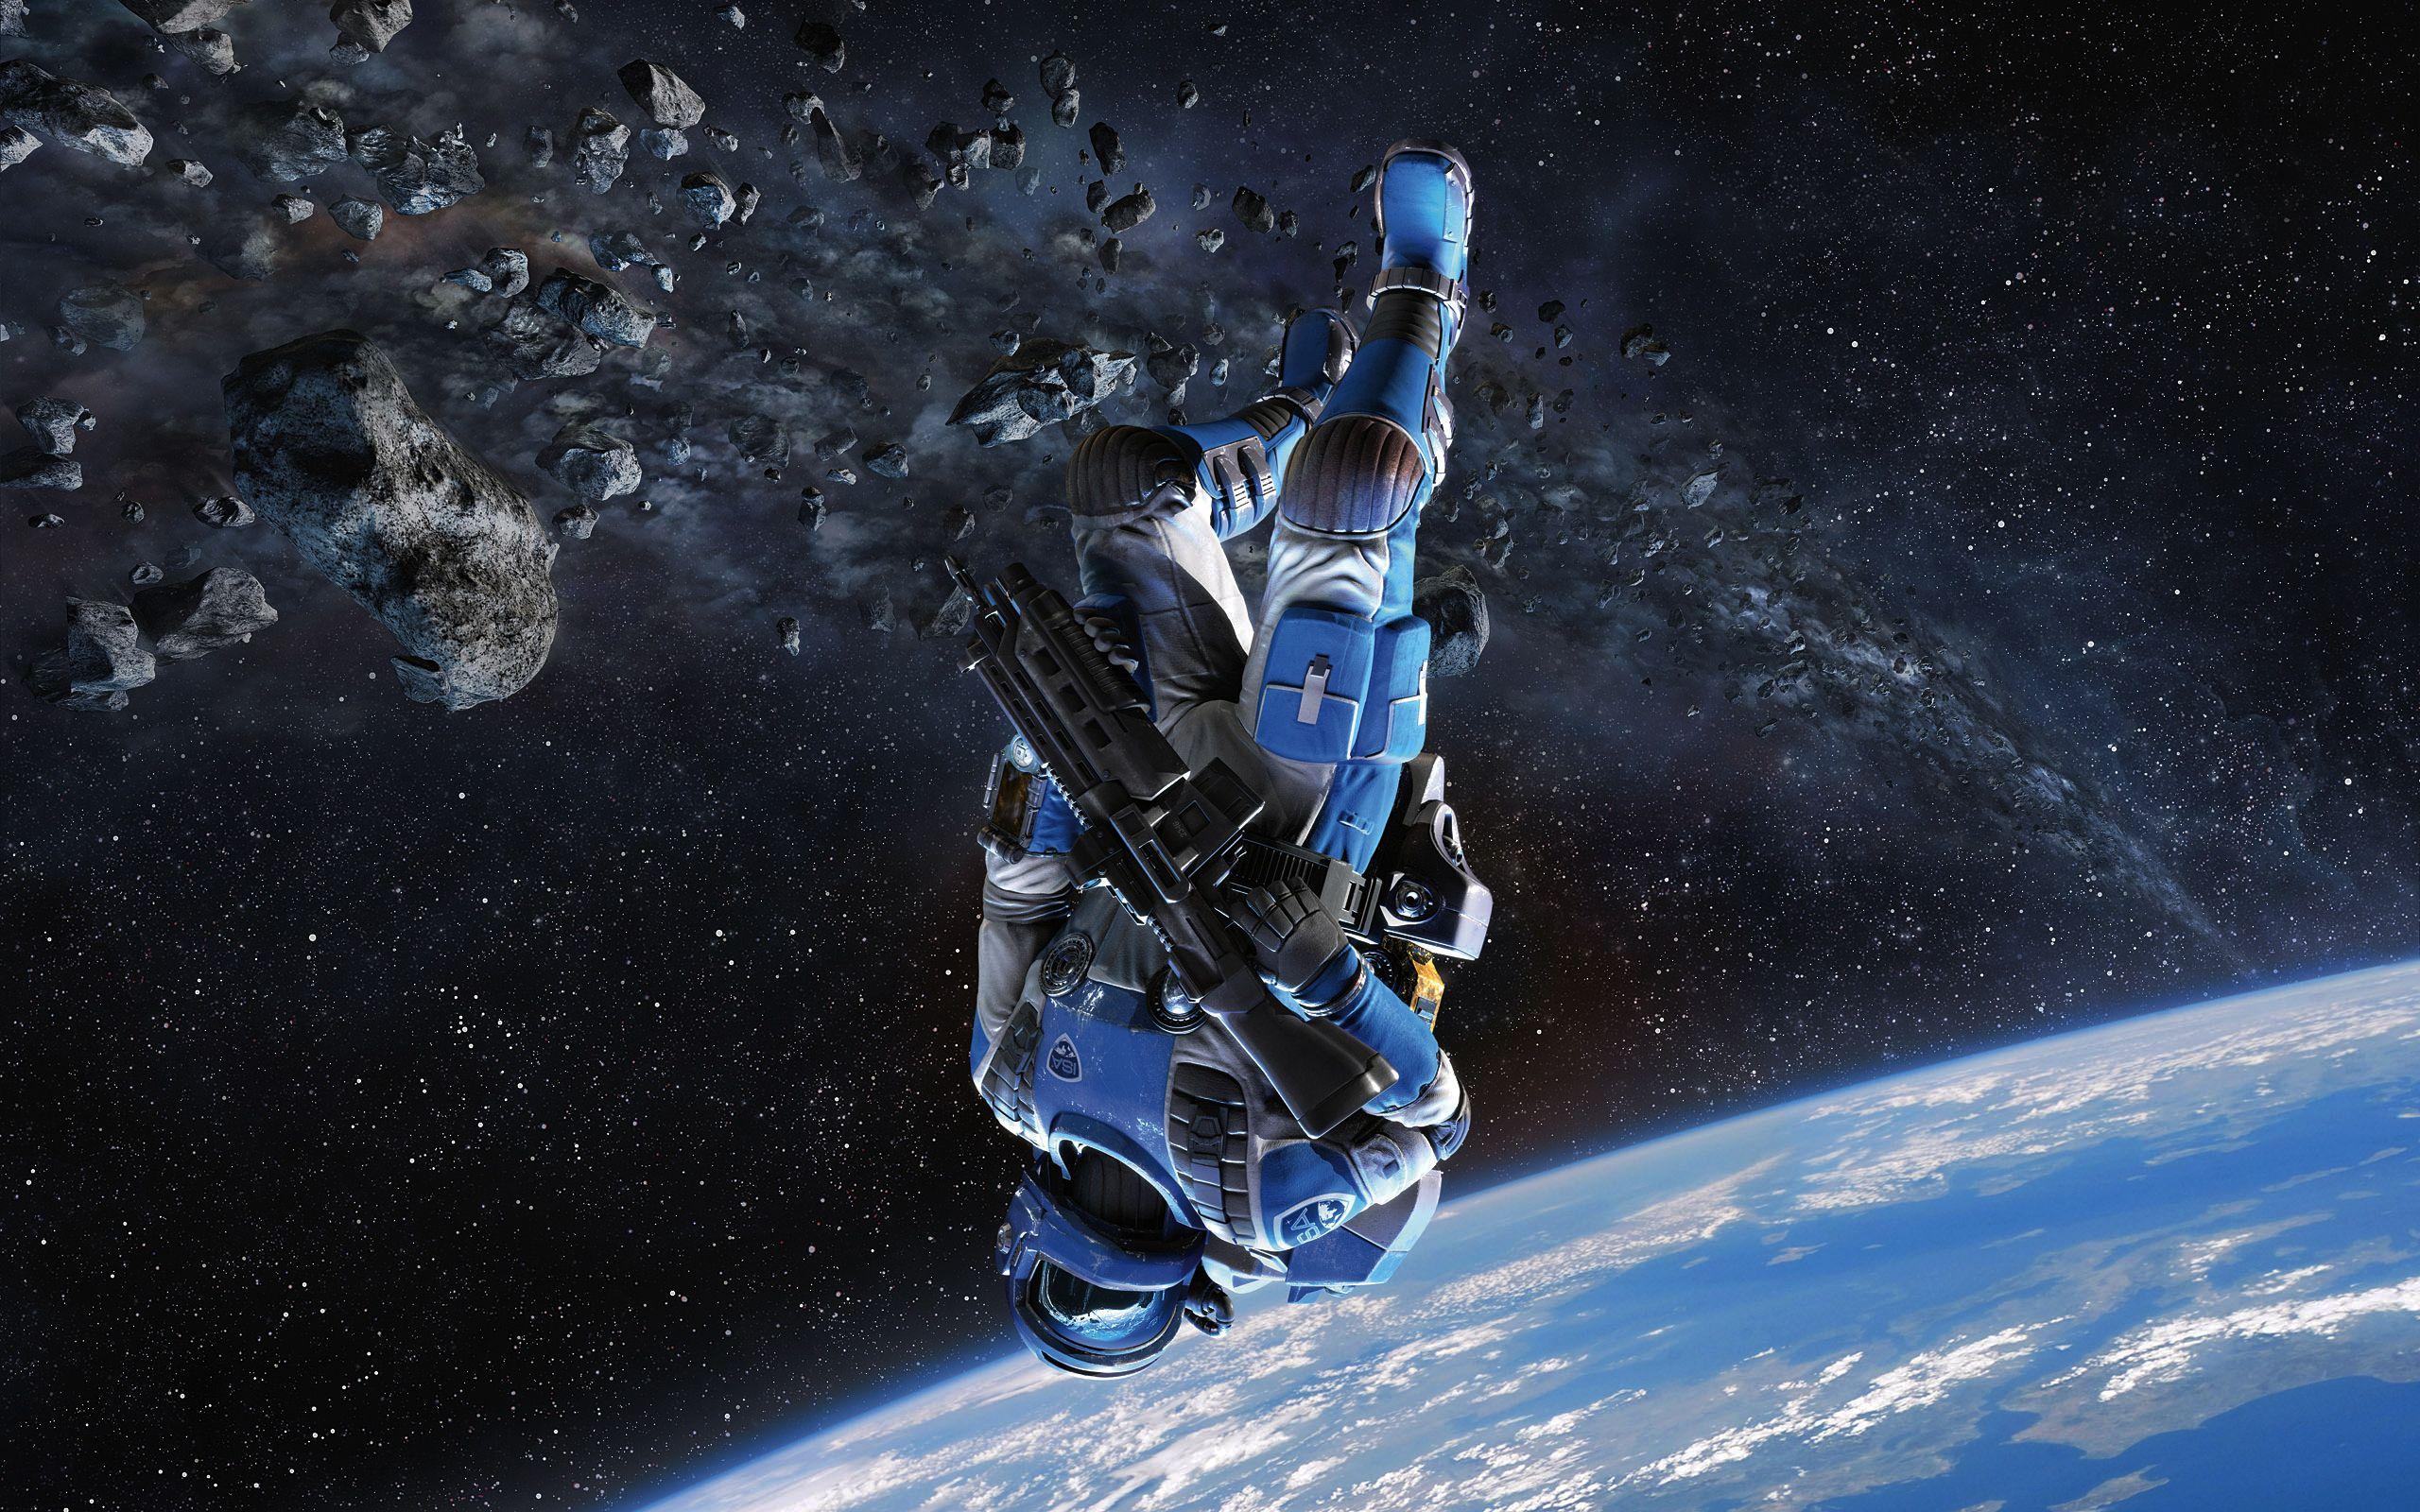 Sci Fi Wallpapers Free Wallpapersafari Warrior Images Sci Fi Wallpaper Space Soldier